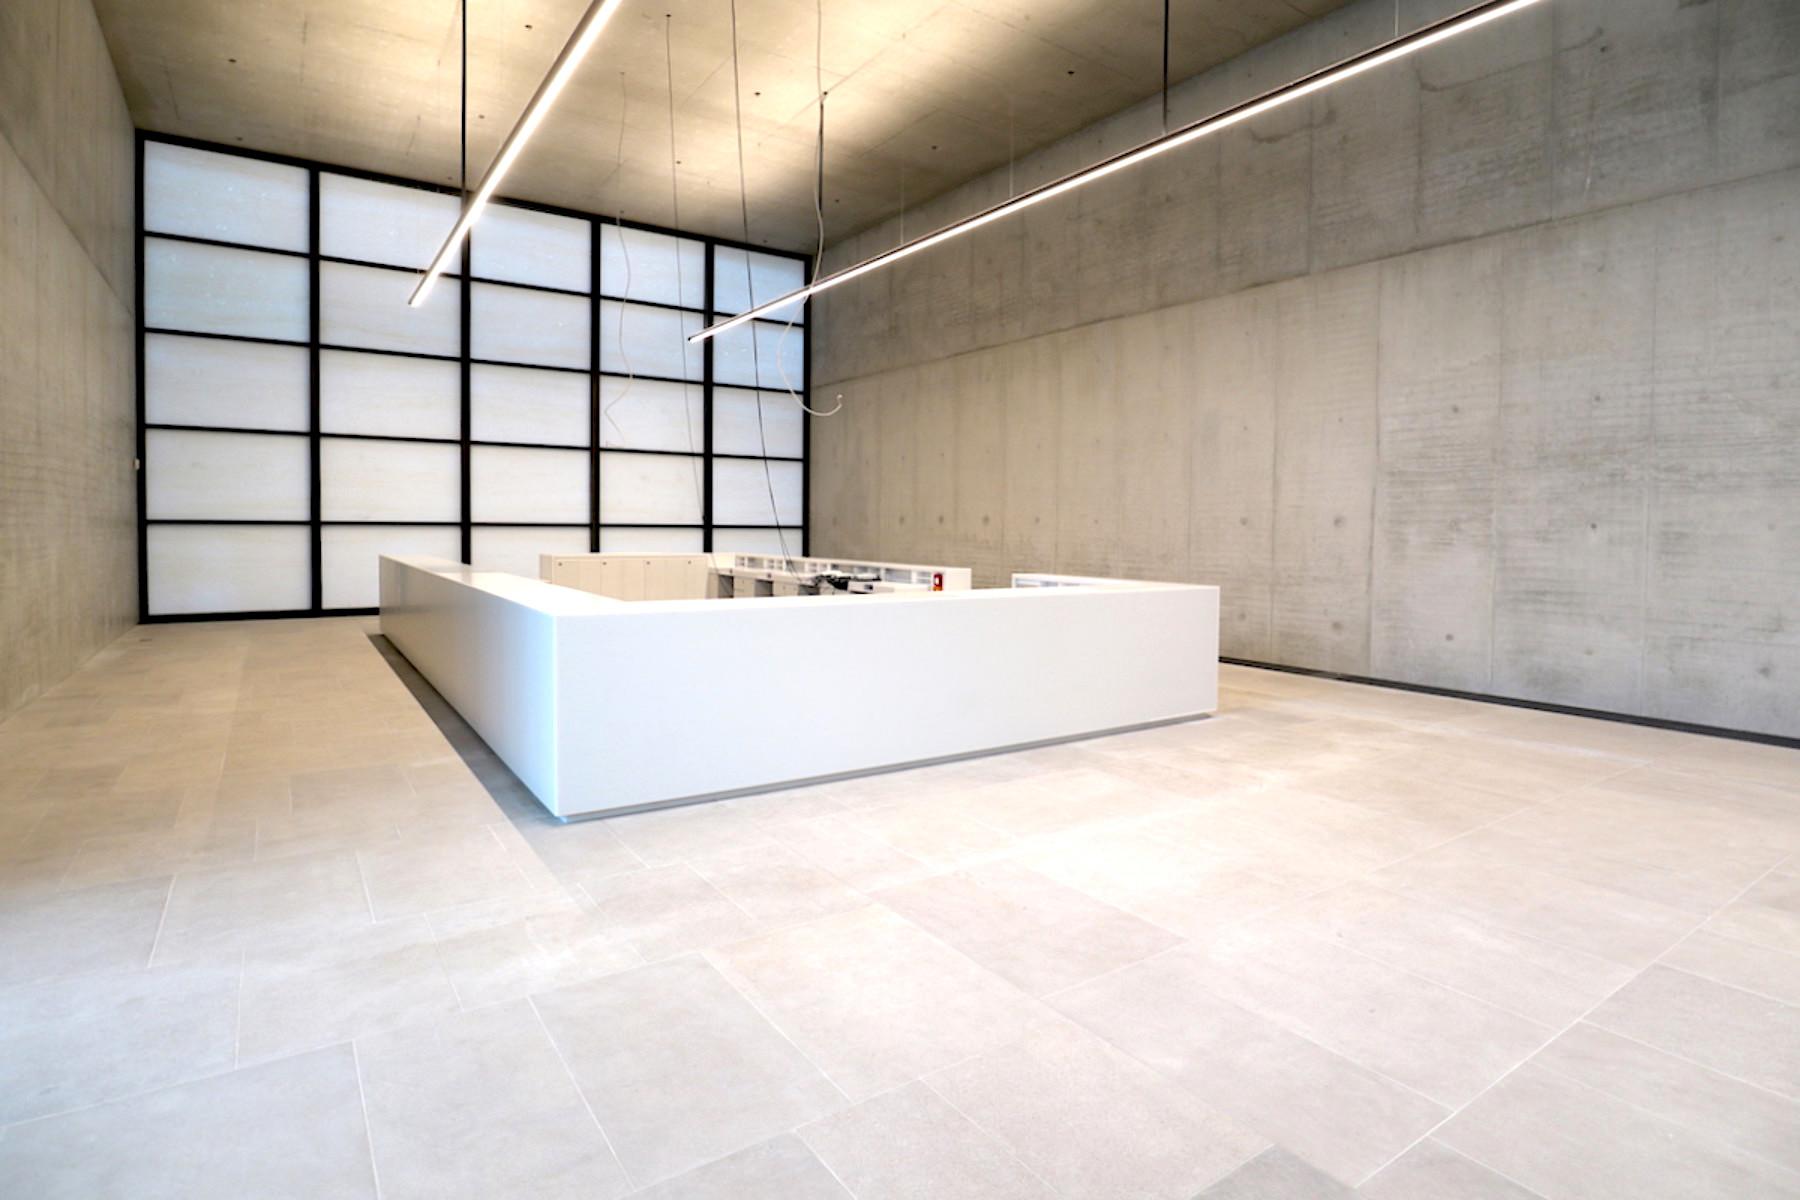 James-Simon-Galerie. ... Fußbodenbeläge aus Muschelkalk, in Kombination ...